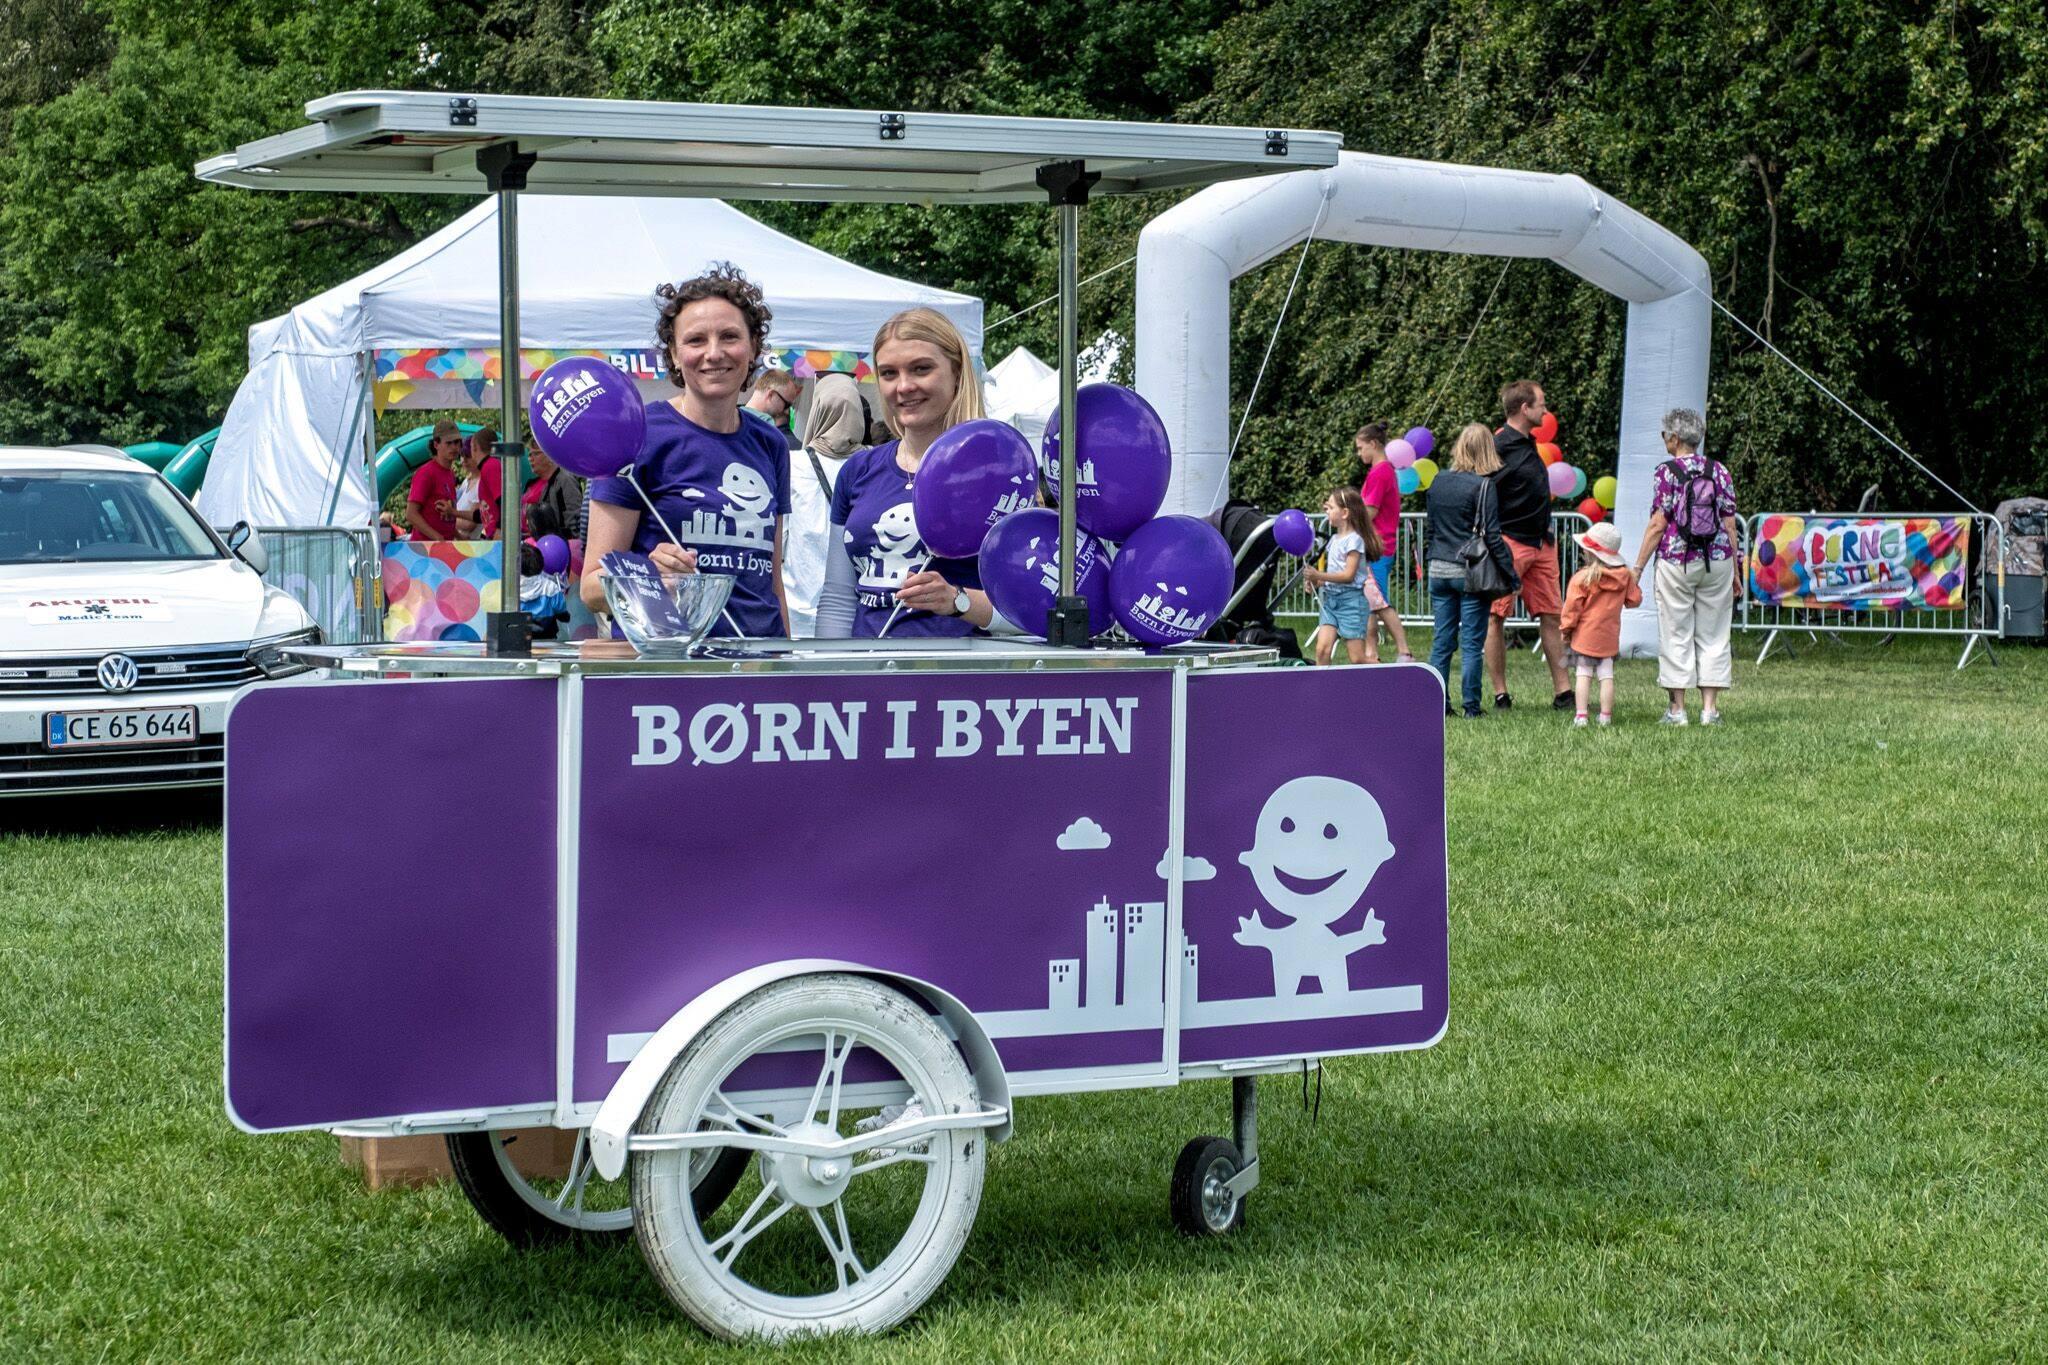 Ice cream cart for Born I Byen